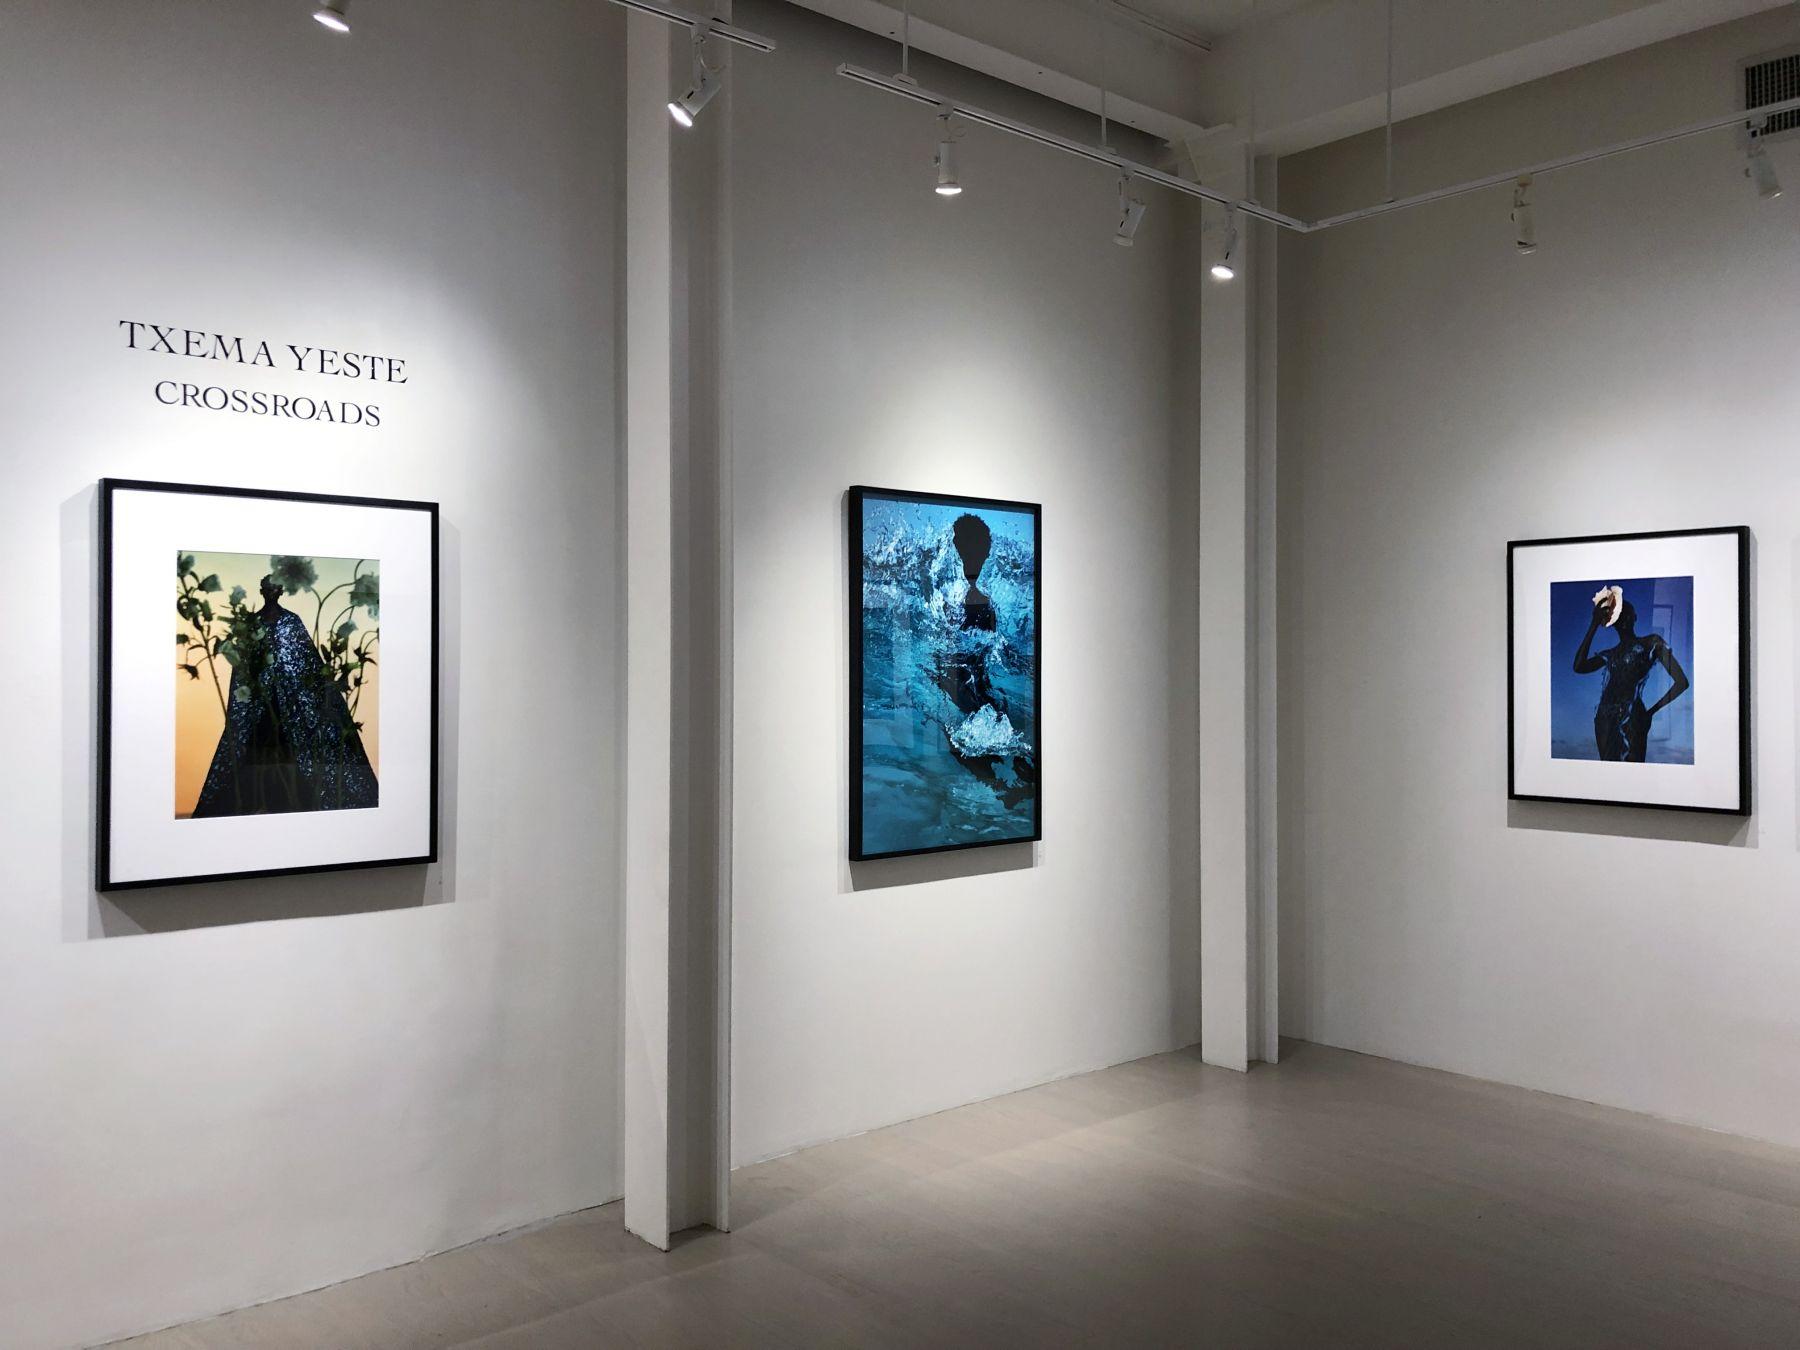 Txema Yeste, Exhibition View